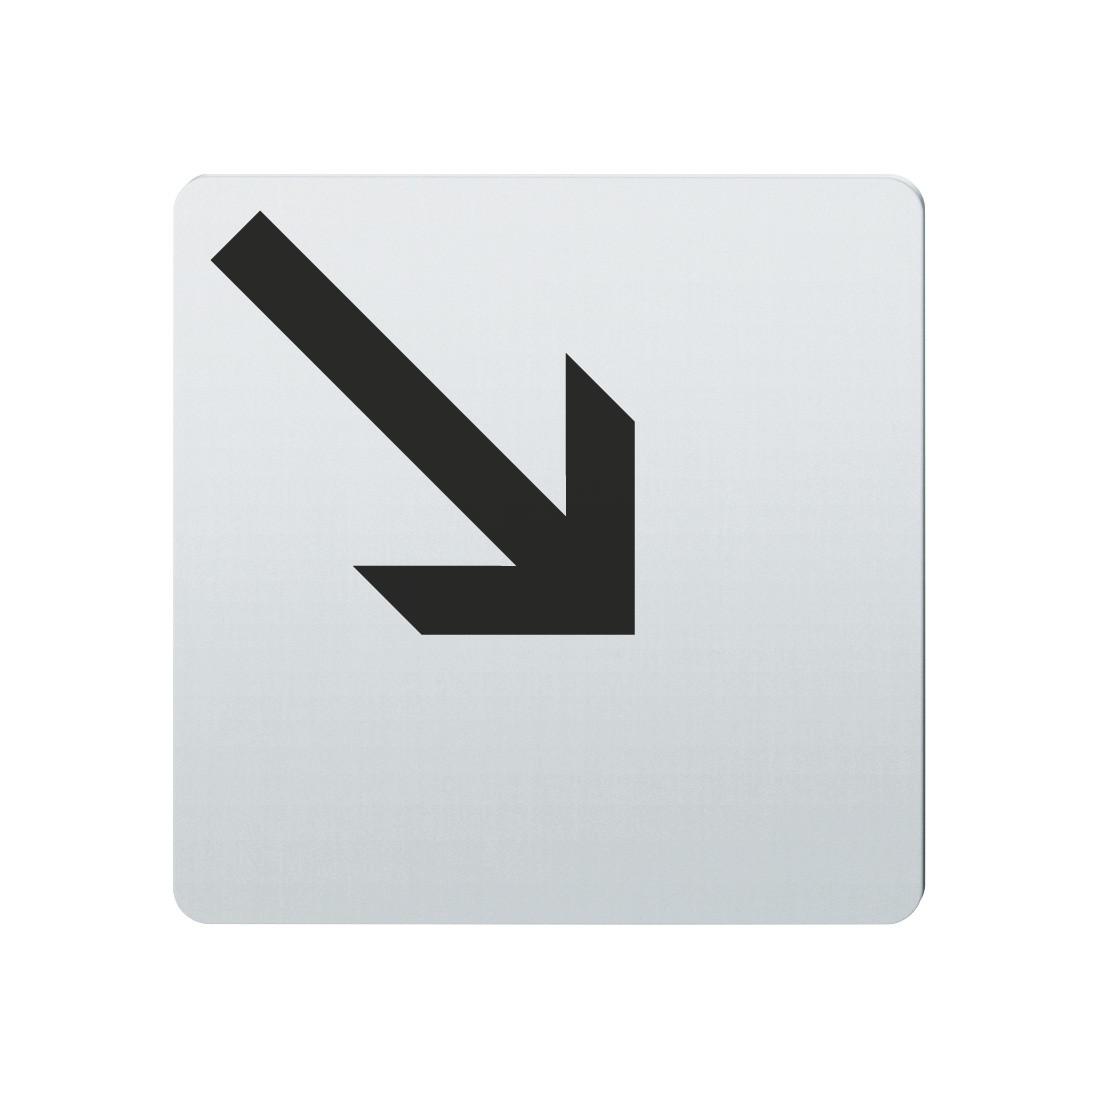 FSB Hinweiszeichen Pfeil nach rechts unten Lasergraviert Edelstahl fein matt (0 36 4059 00006 6204)